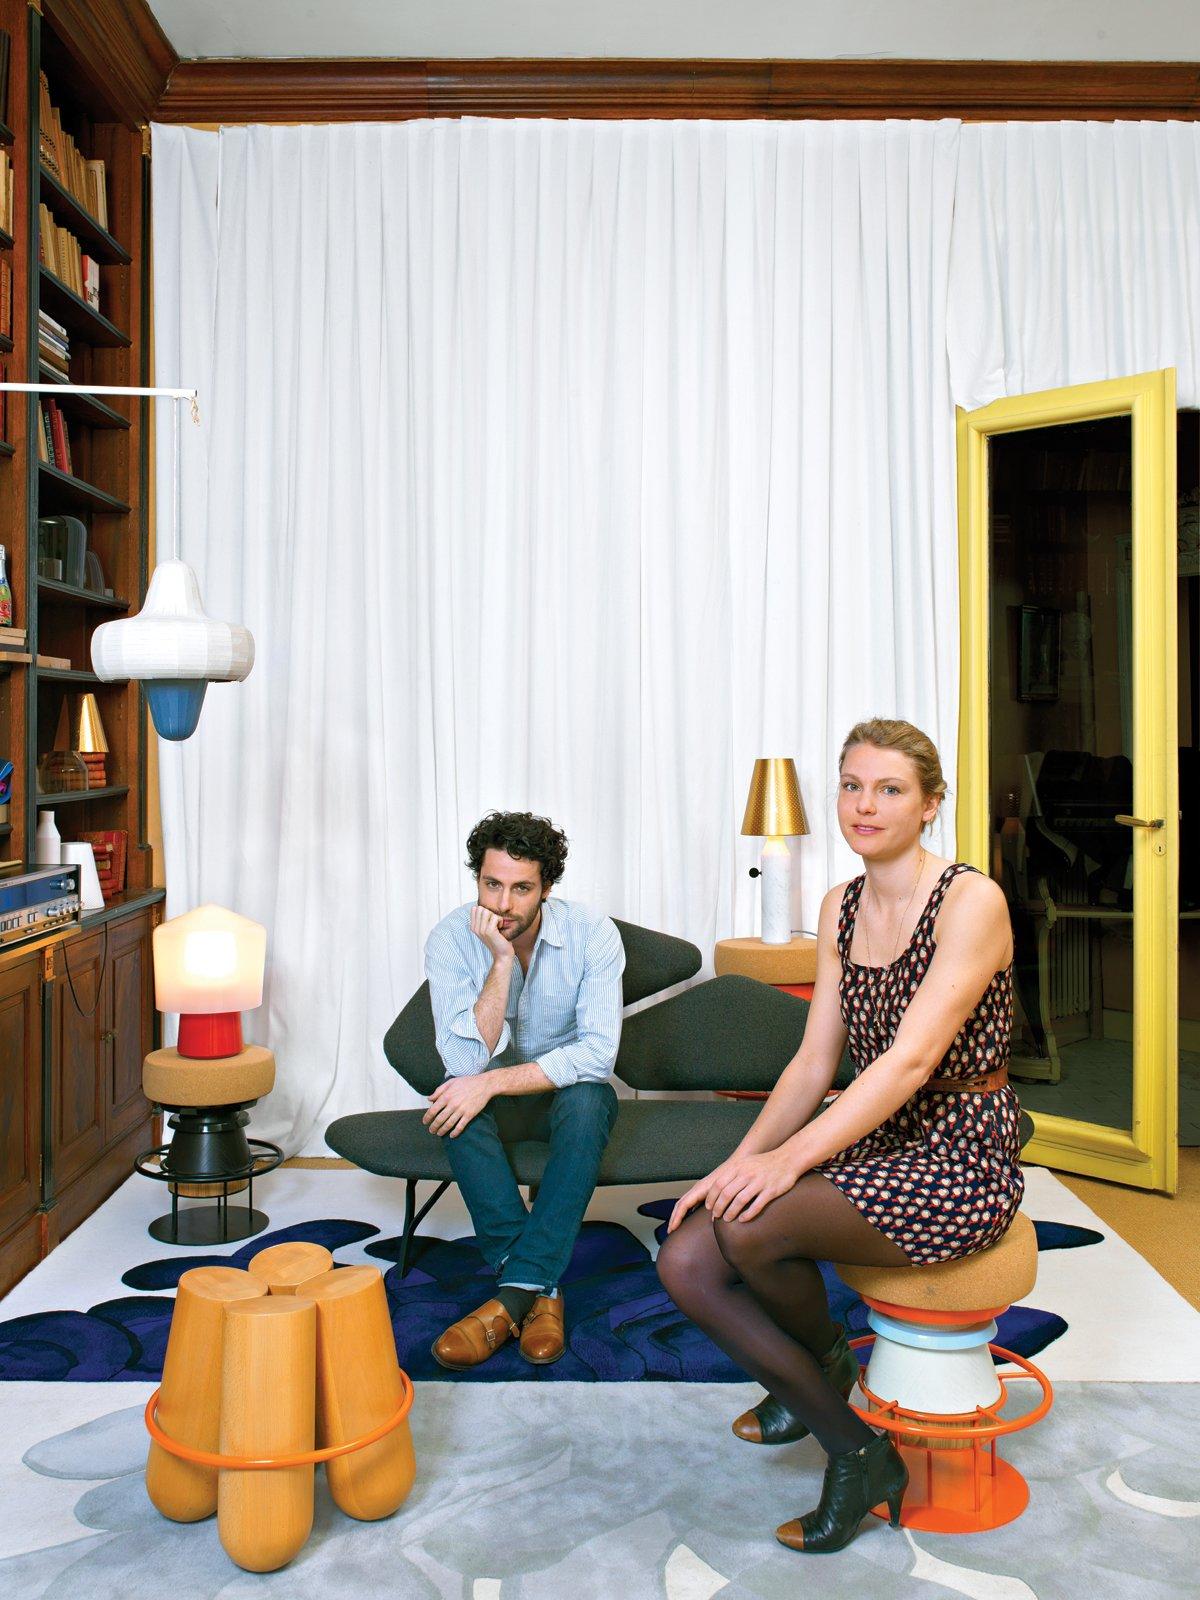 Designer Möbel Kollektion La Chance ~ Möbel Ideen & Innenarchitektur